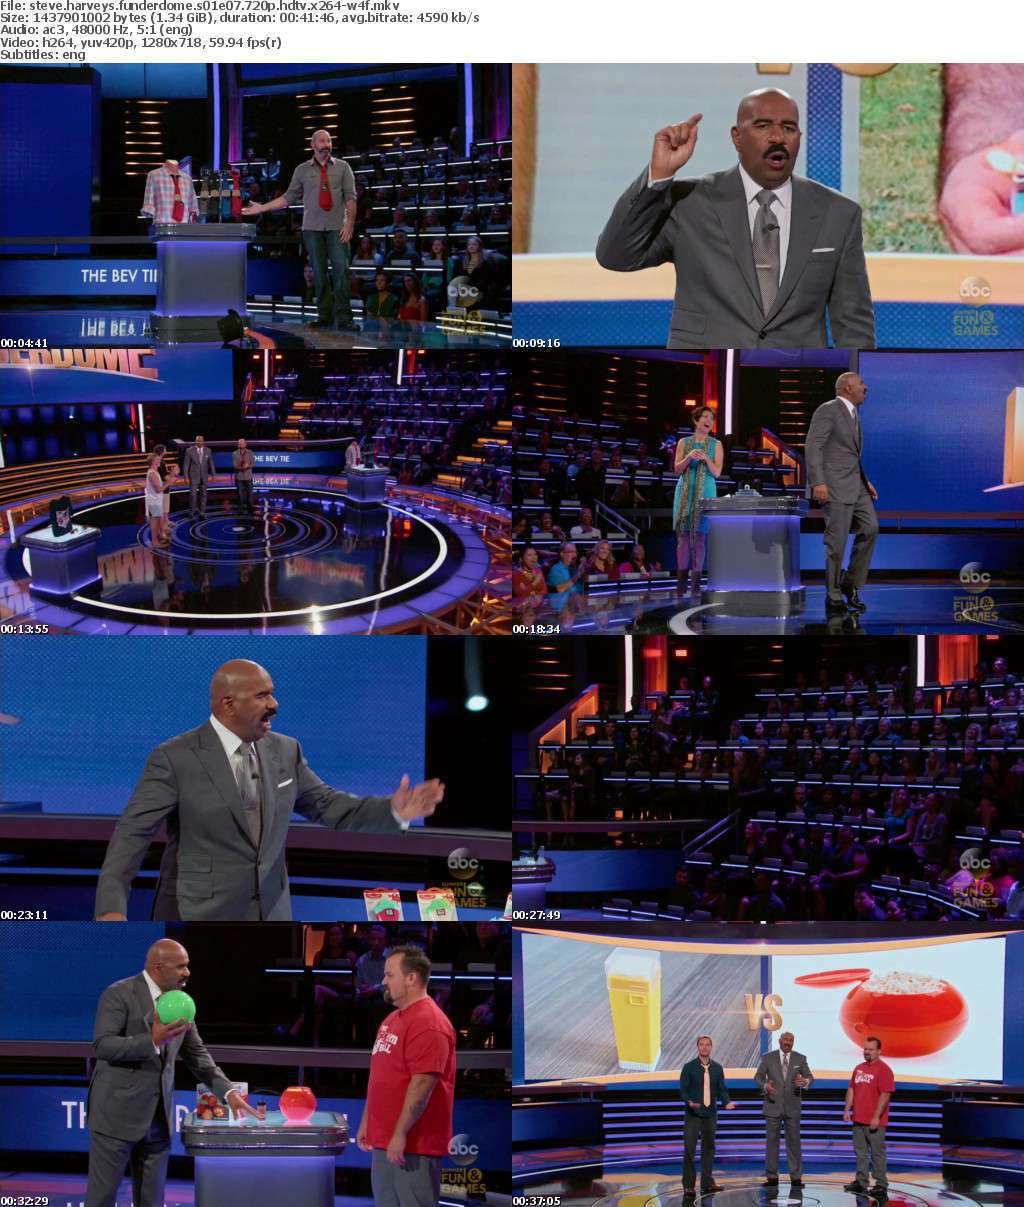 Steve Harveys FUNDERDOME S01E07 720p HDTV x264-W4F